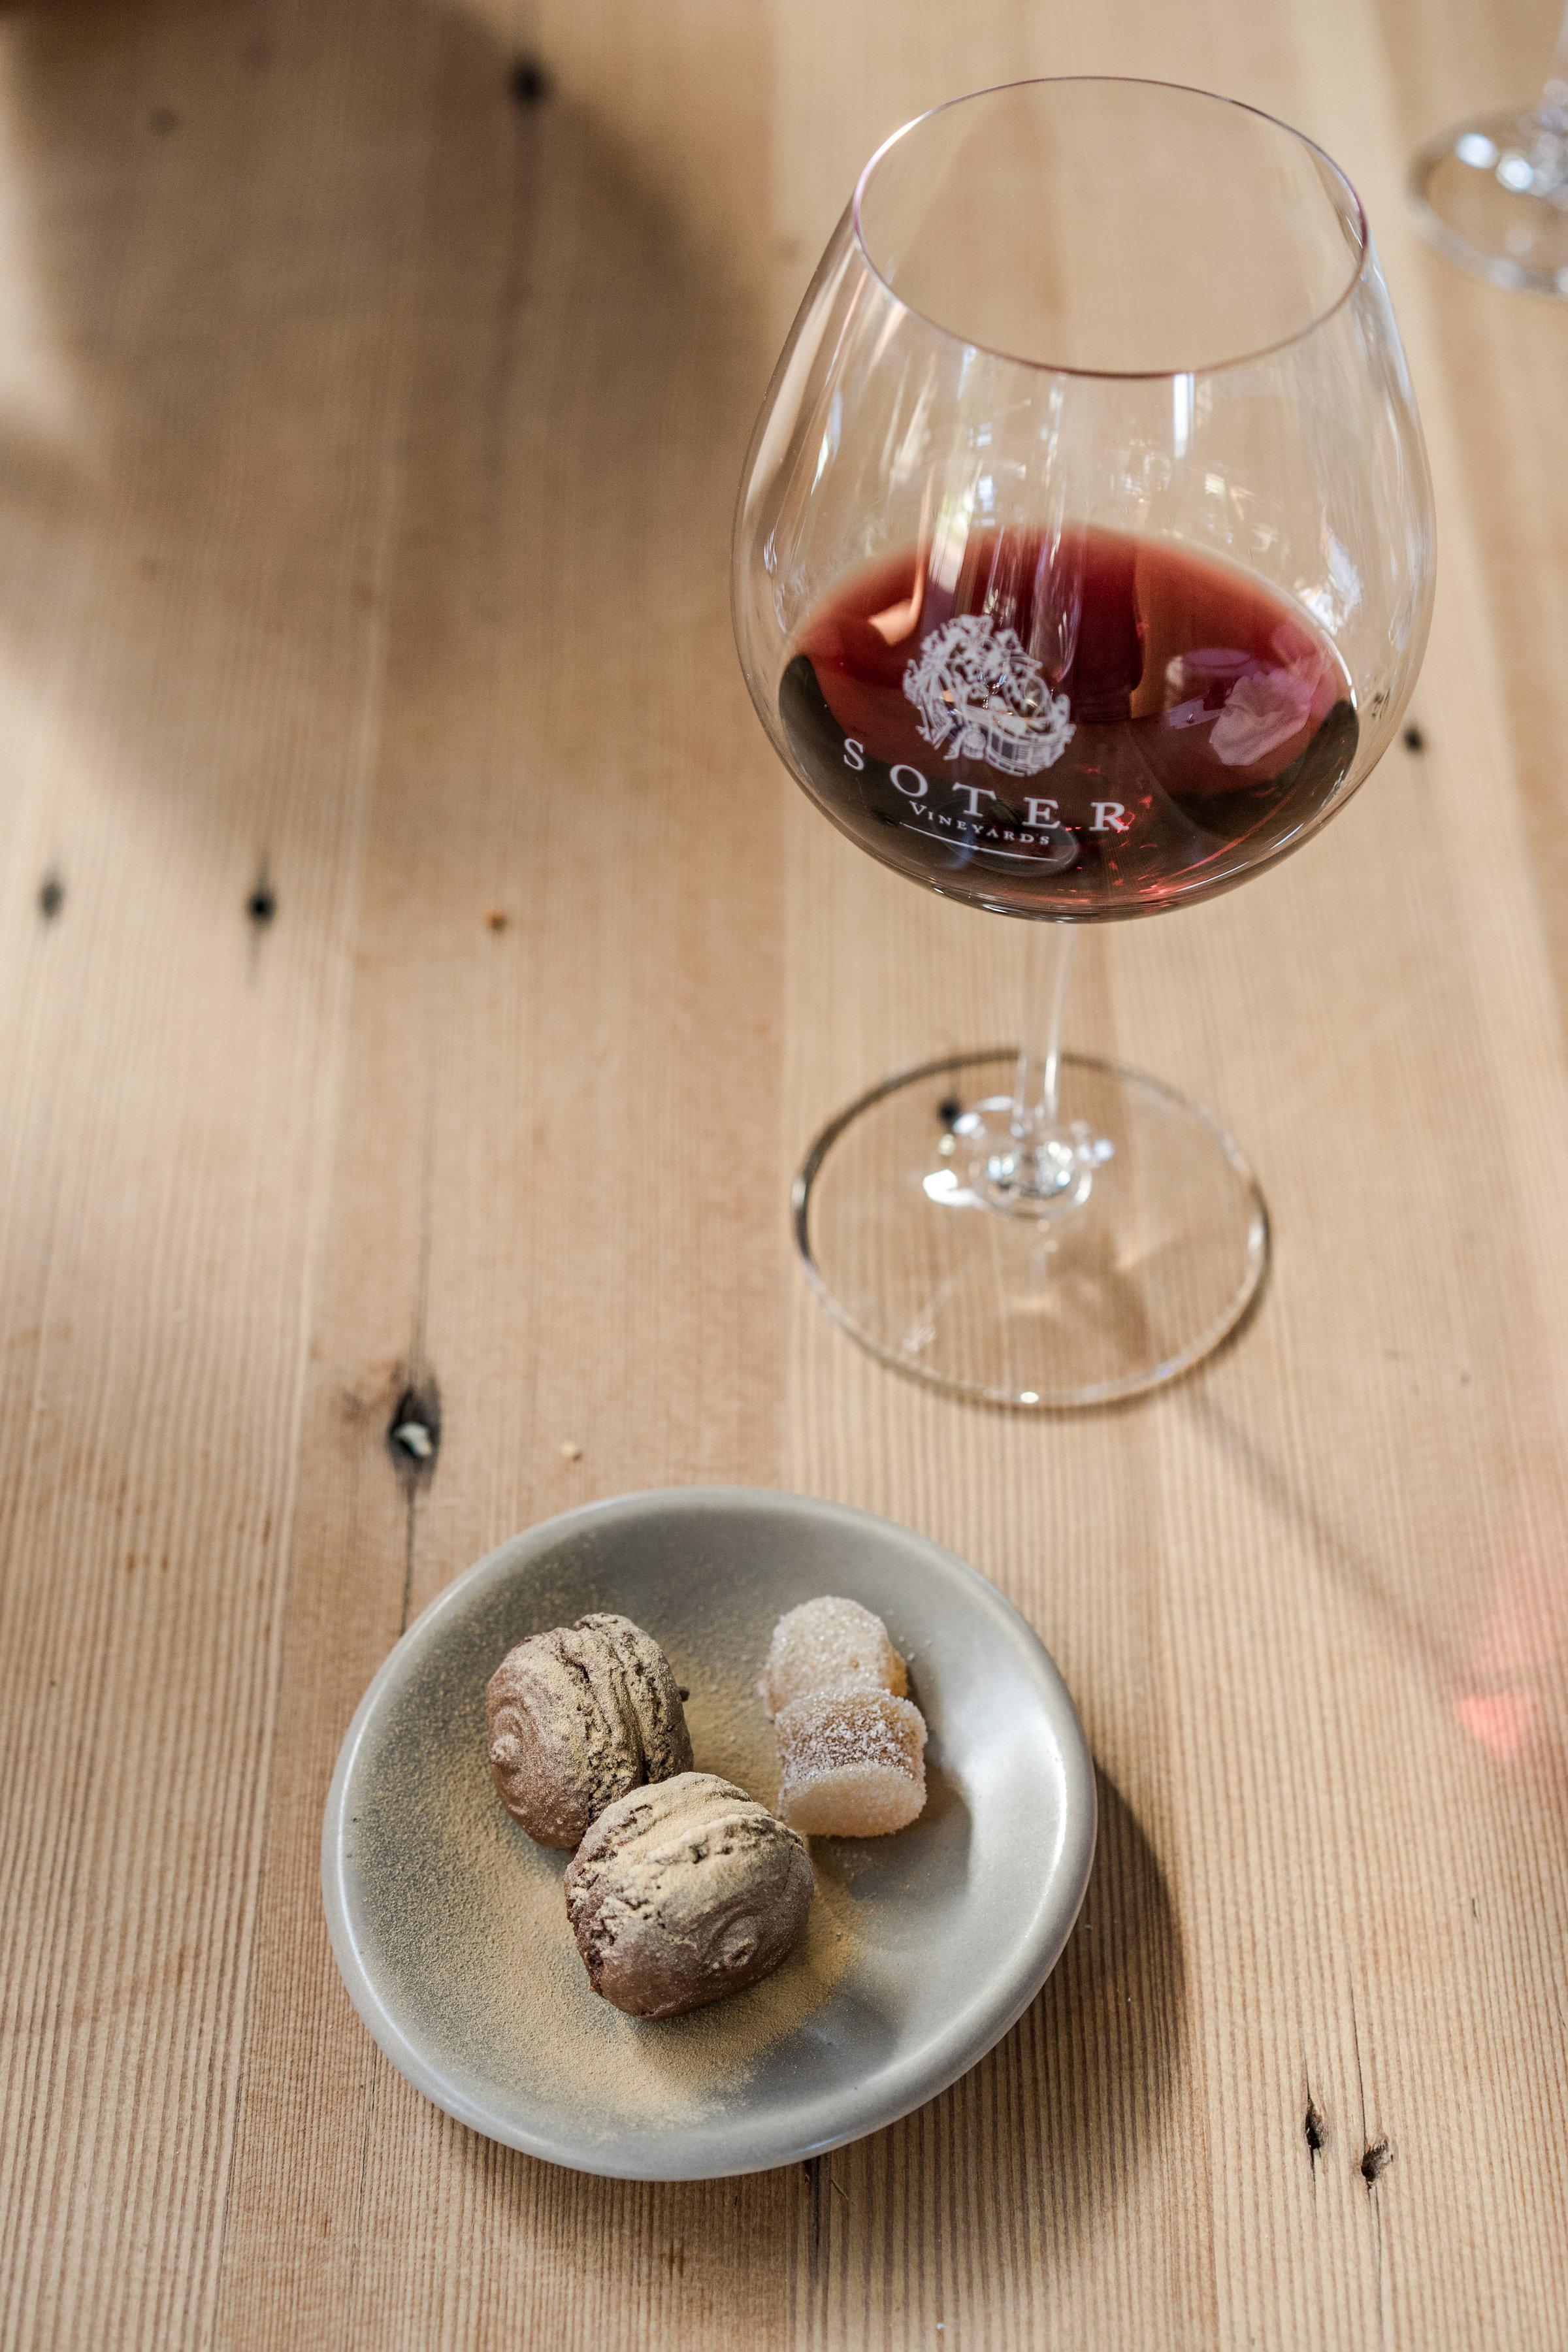 soter wine luscious porcelain IPNC 2018 dessert.JPG